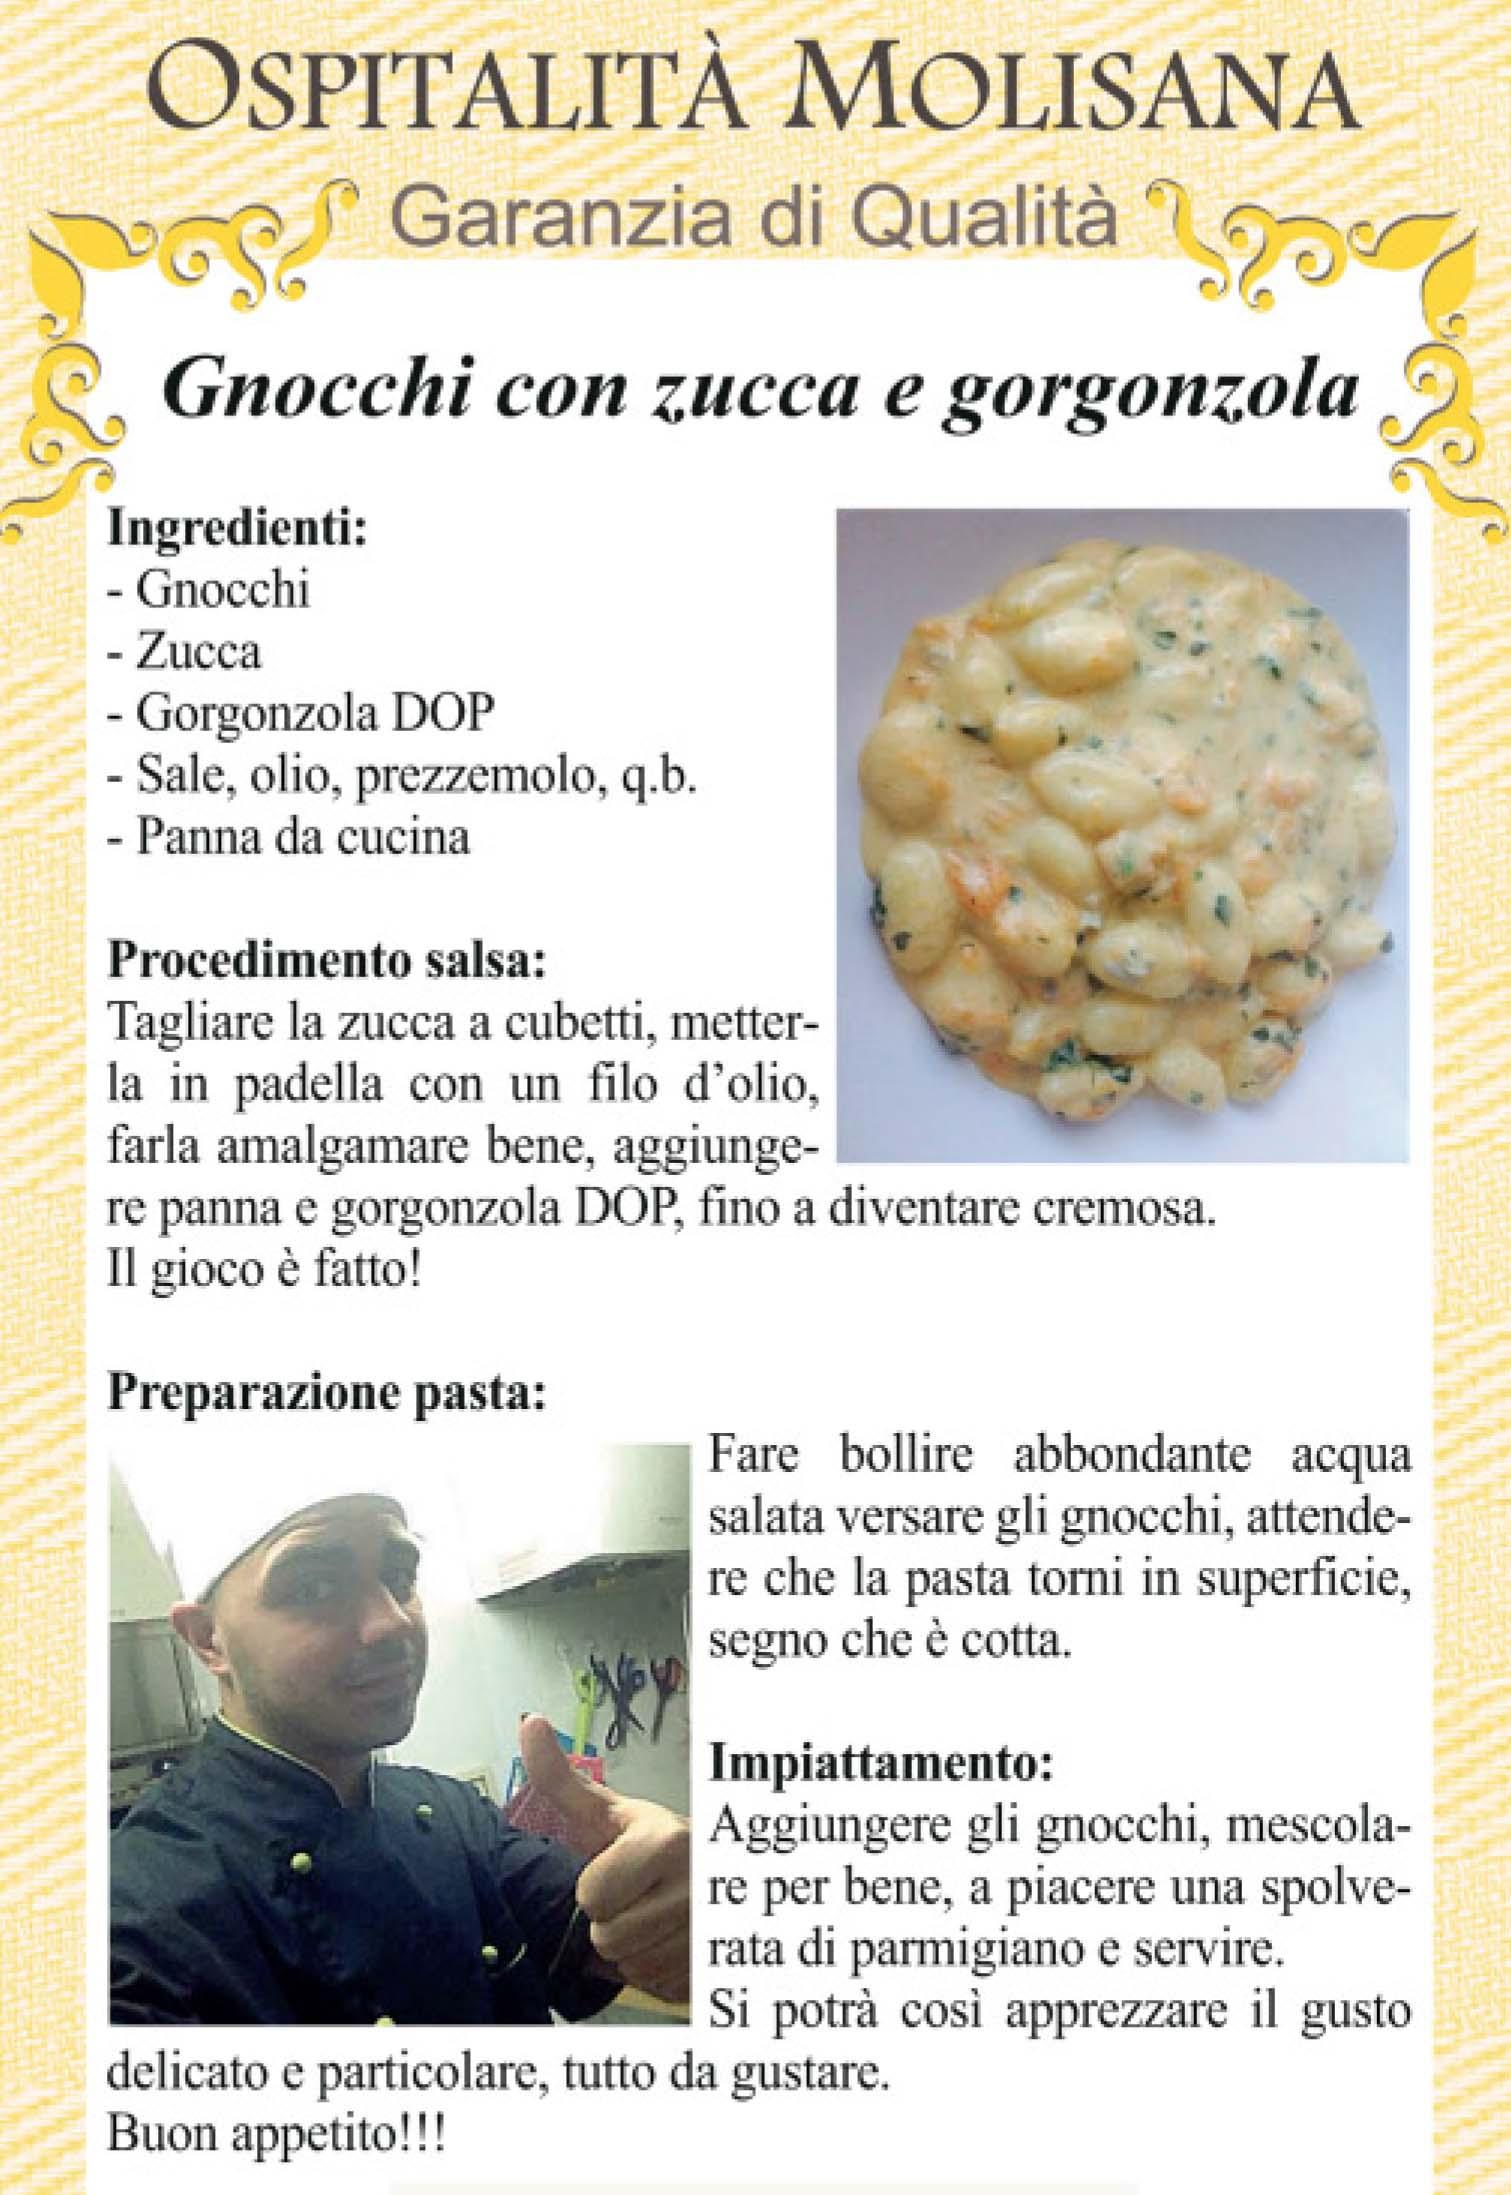 OSPITALITA' MOLISANA – Gnocchi con zucca e gorgonzola